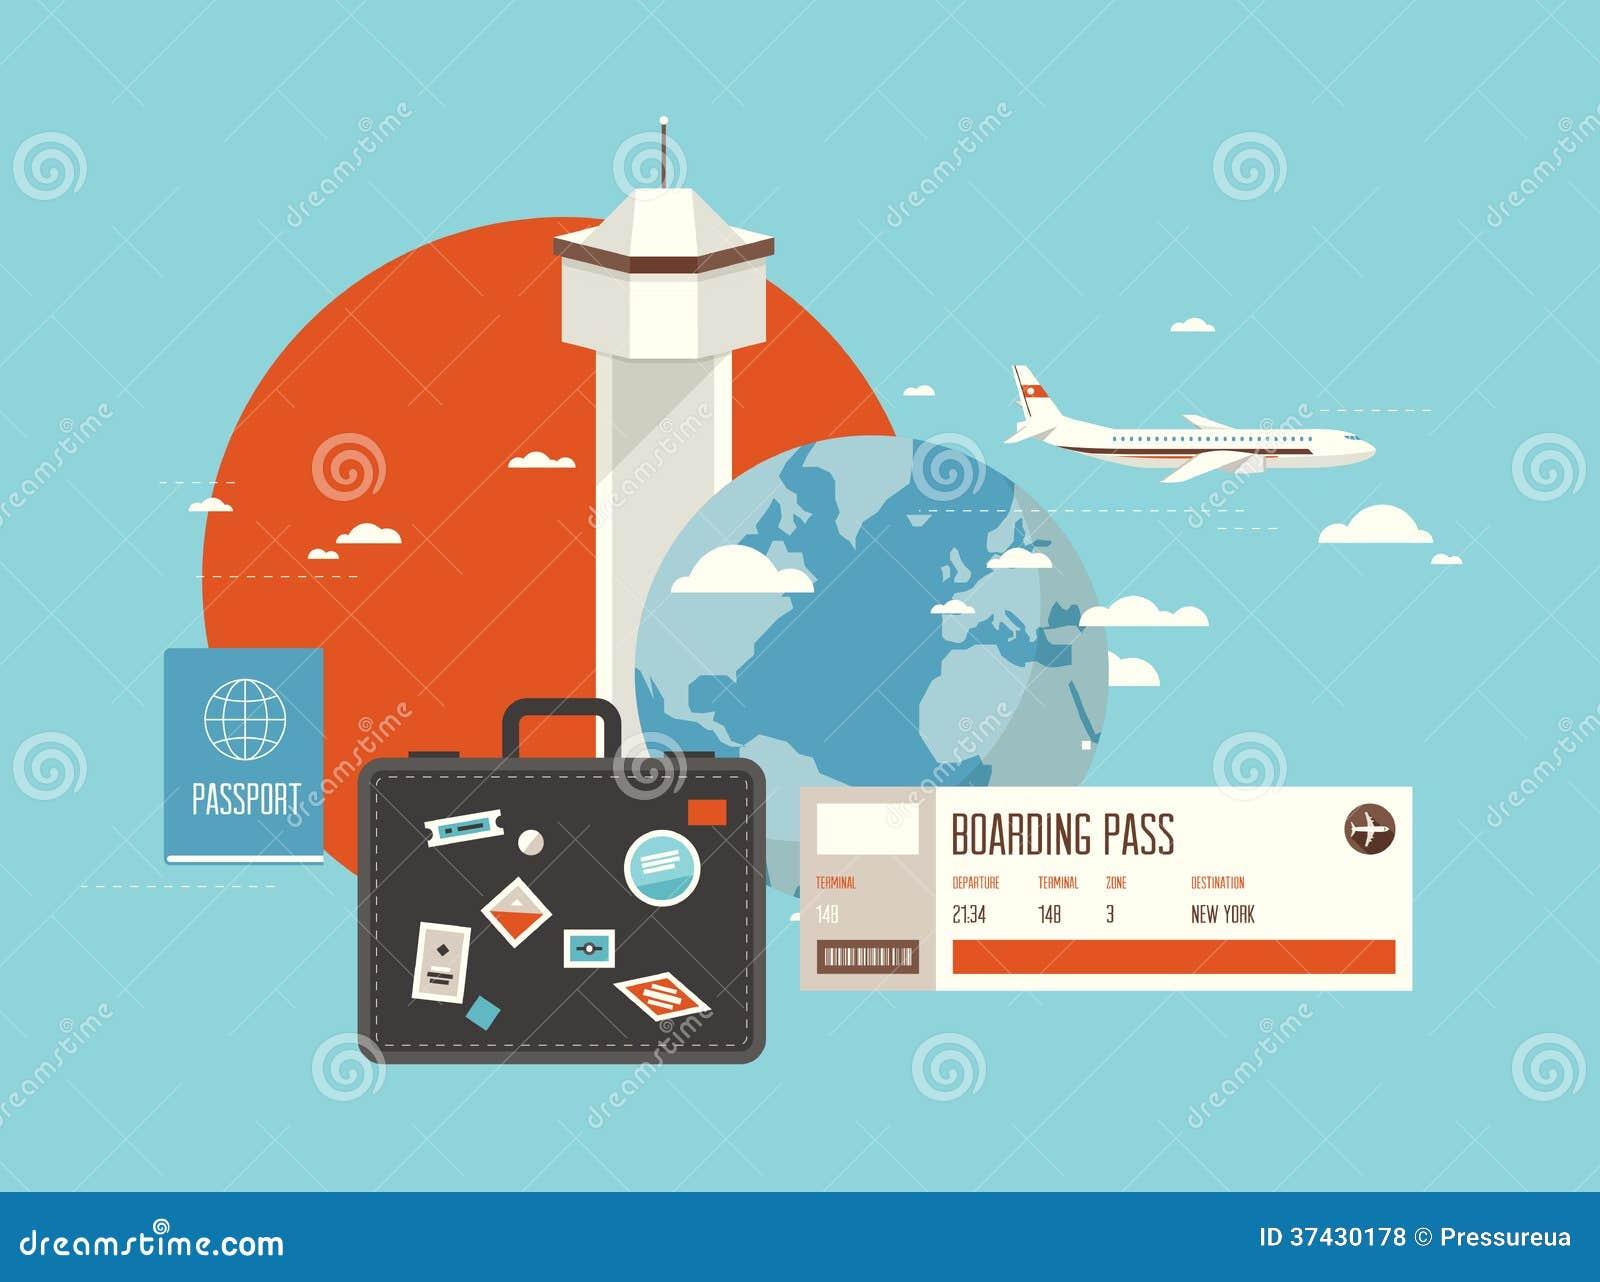 Flat Illustration Of Travel On Airplane Royalty Free Stock